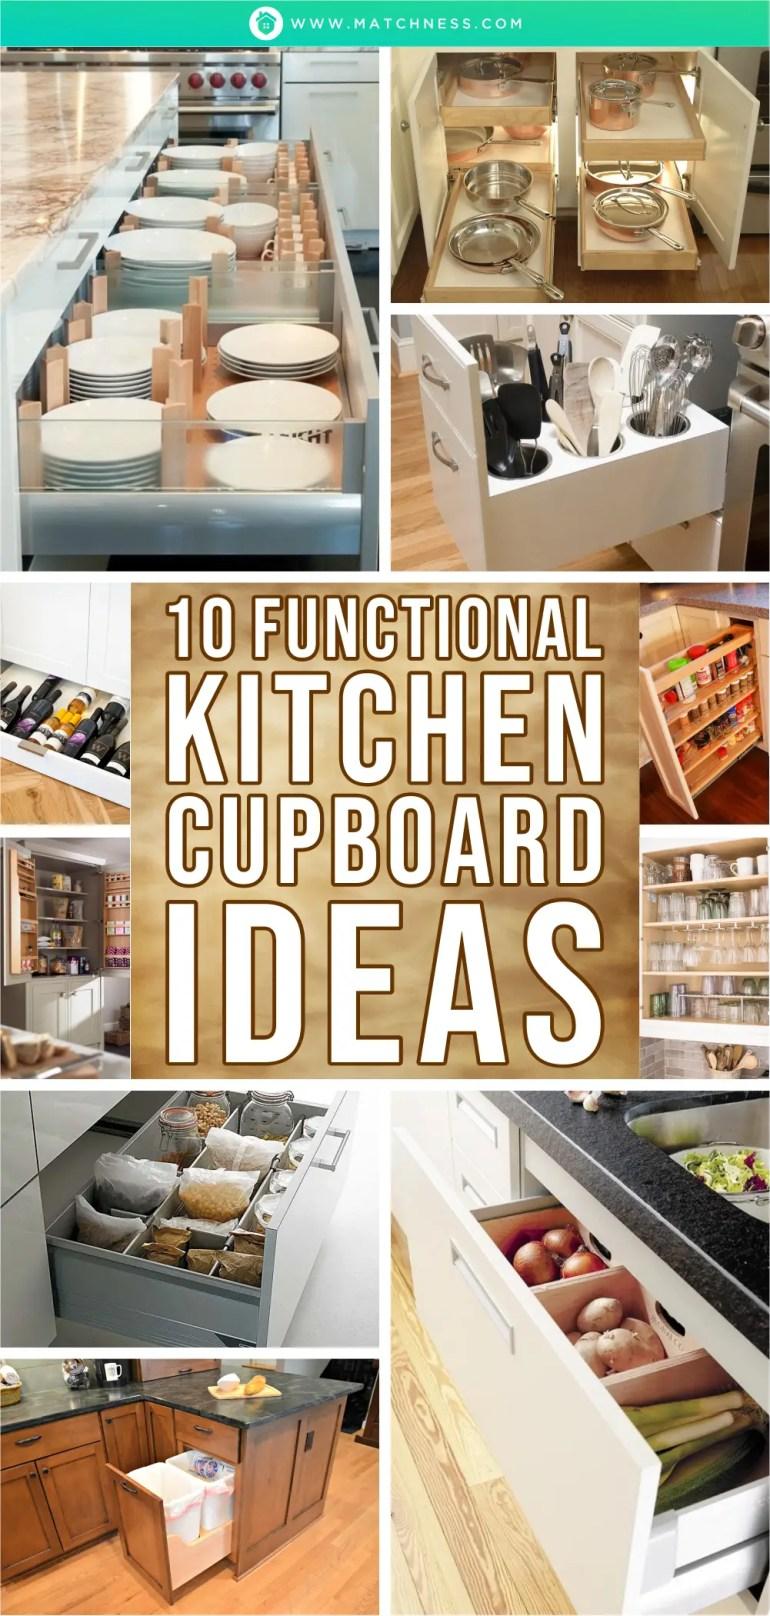 10-functional-kitchen-cupboard-ideas1